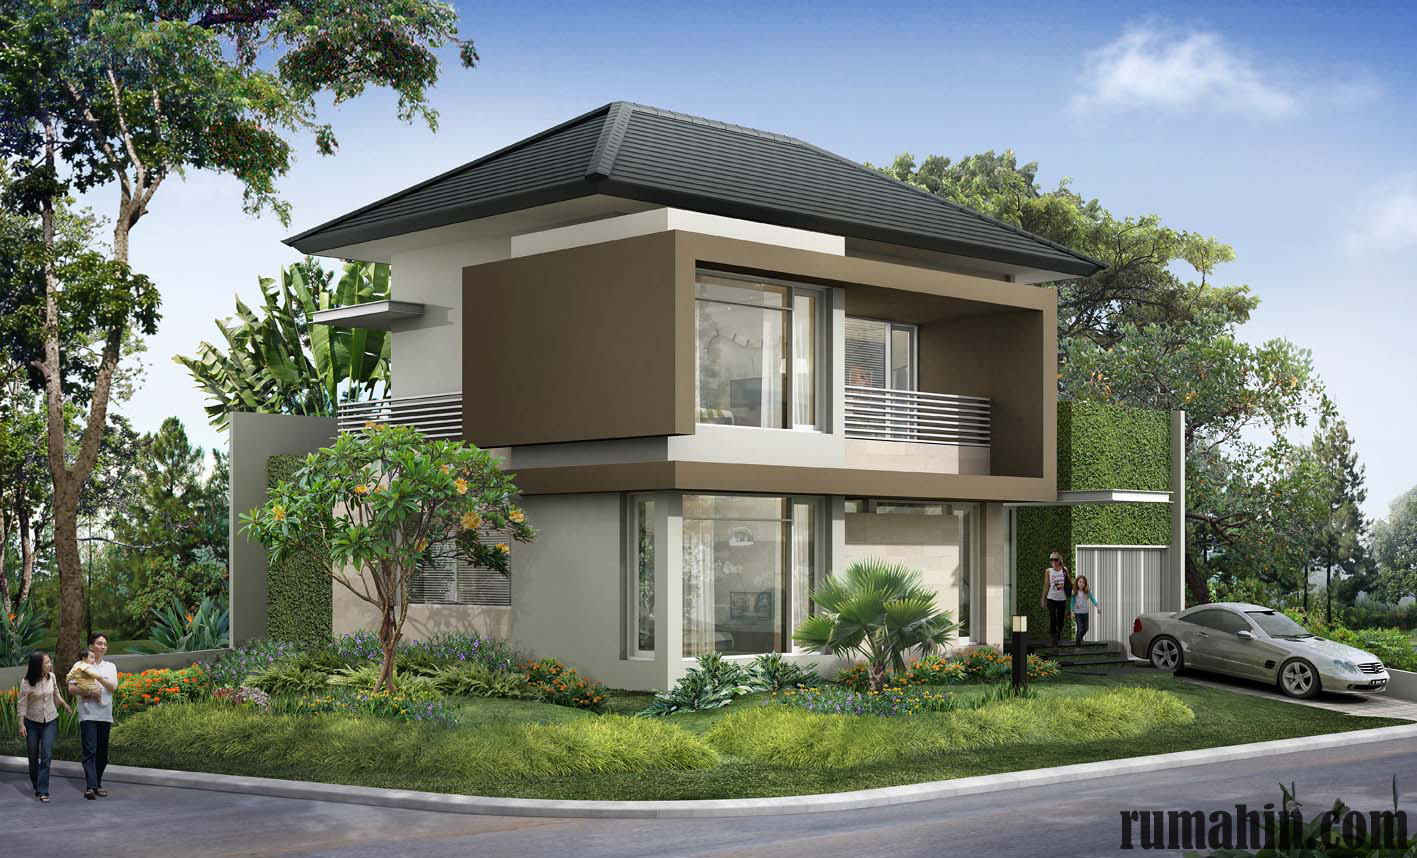 Rumah Kaca Minimalis Gaya Rumah Jepang Modern Rumah Minimalis 2015